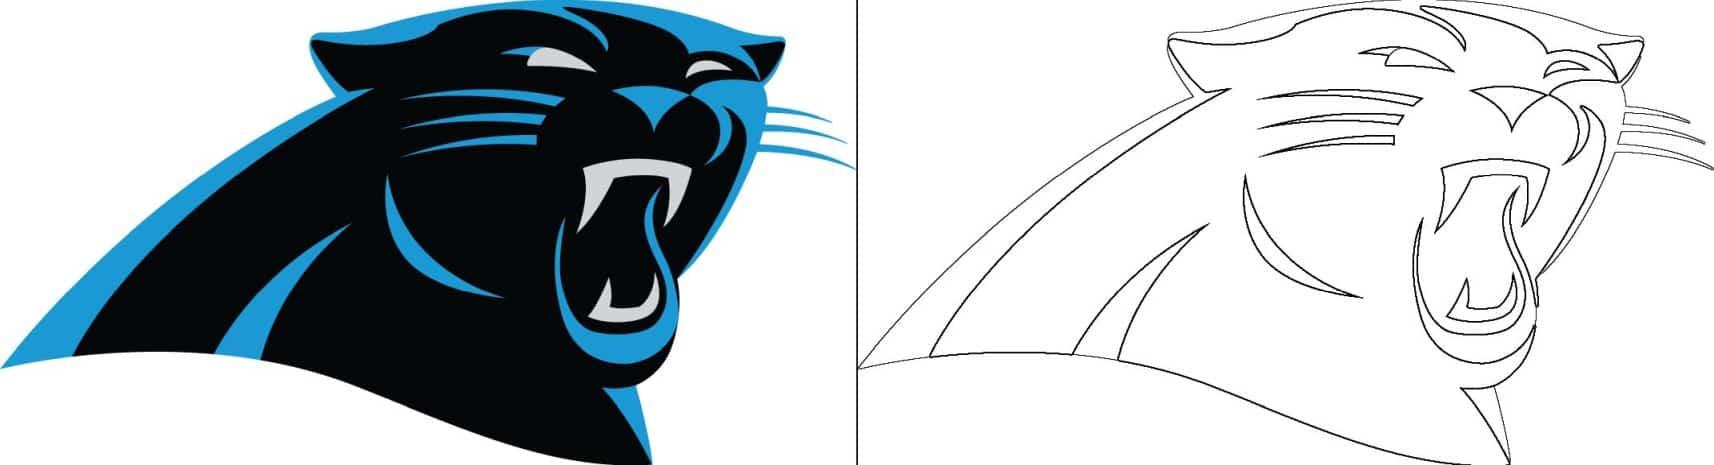 Coloriage Logo avec un échantillon de Carolina Panthers